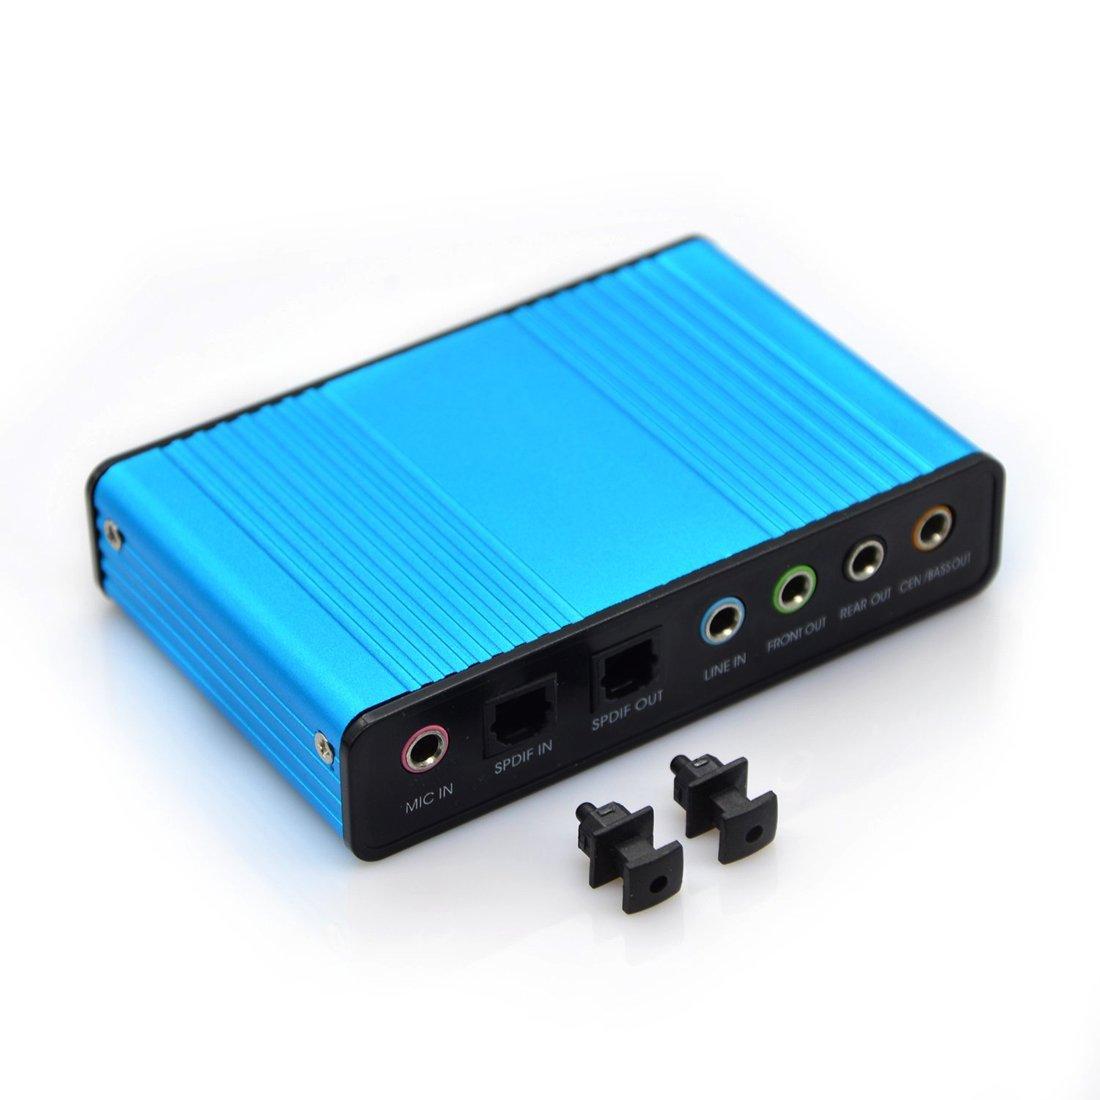 Easy-Link Externe Soundkarte USB 6 Kanal 5.1 Audiokarte USB Soundbox mit SPDIF Didital Audio - 5.1 Surround Audio Adapter Analoge und Digitale Audiogerä te fü r Windows / Laptop / PC SHENZHEN YOUWEI GONGCHUANG TECHNOLOGY CO. LTD USD651